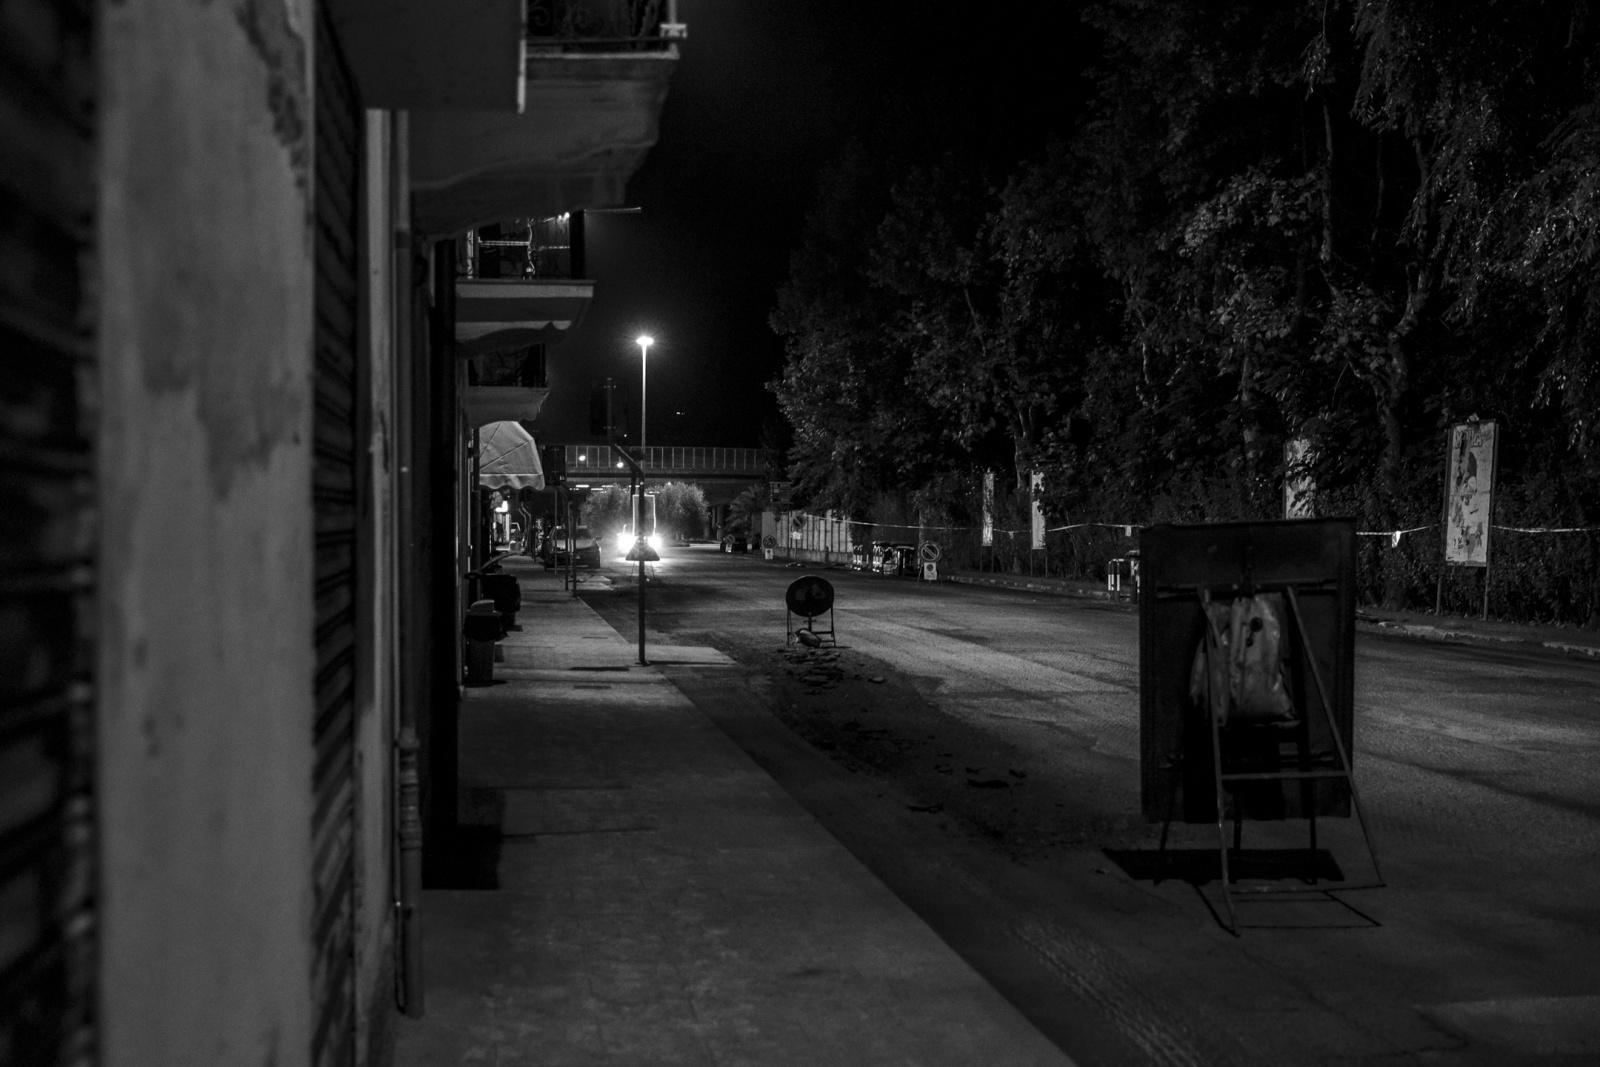 Vado, di notte